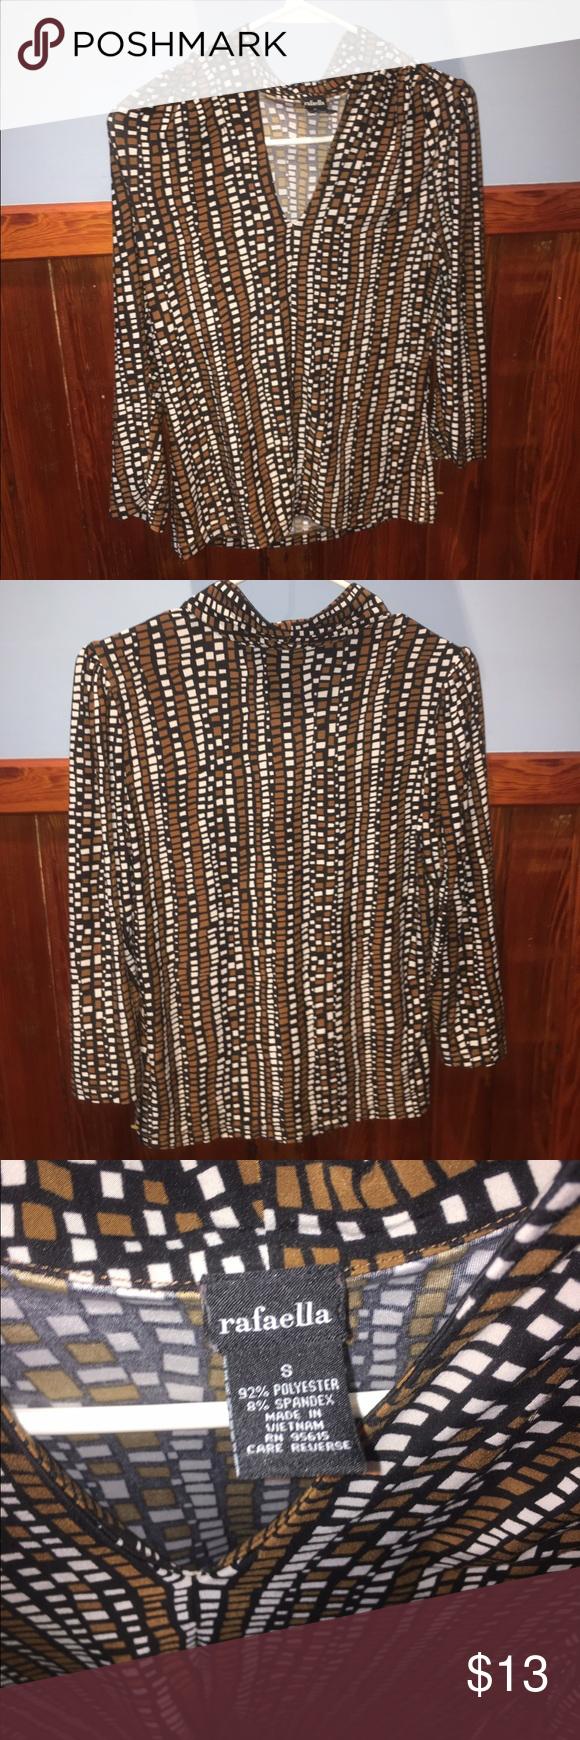 Comfy & classy blouse Brand is Rafaella. Size is small. Feels amazing!! Rafaella Tops Blouses